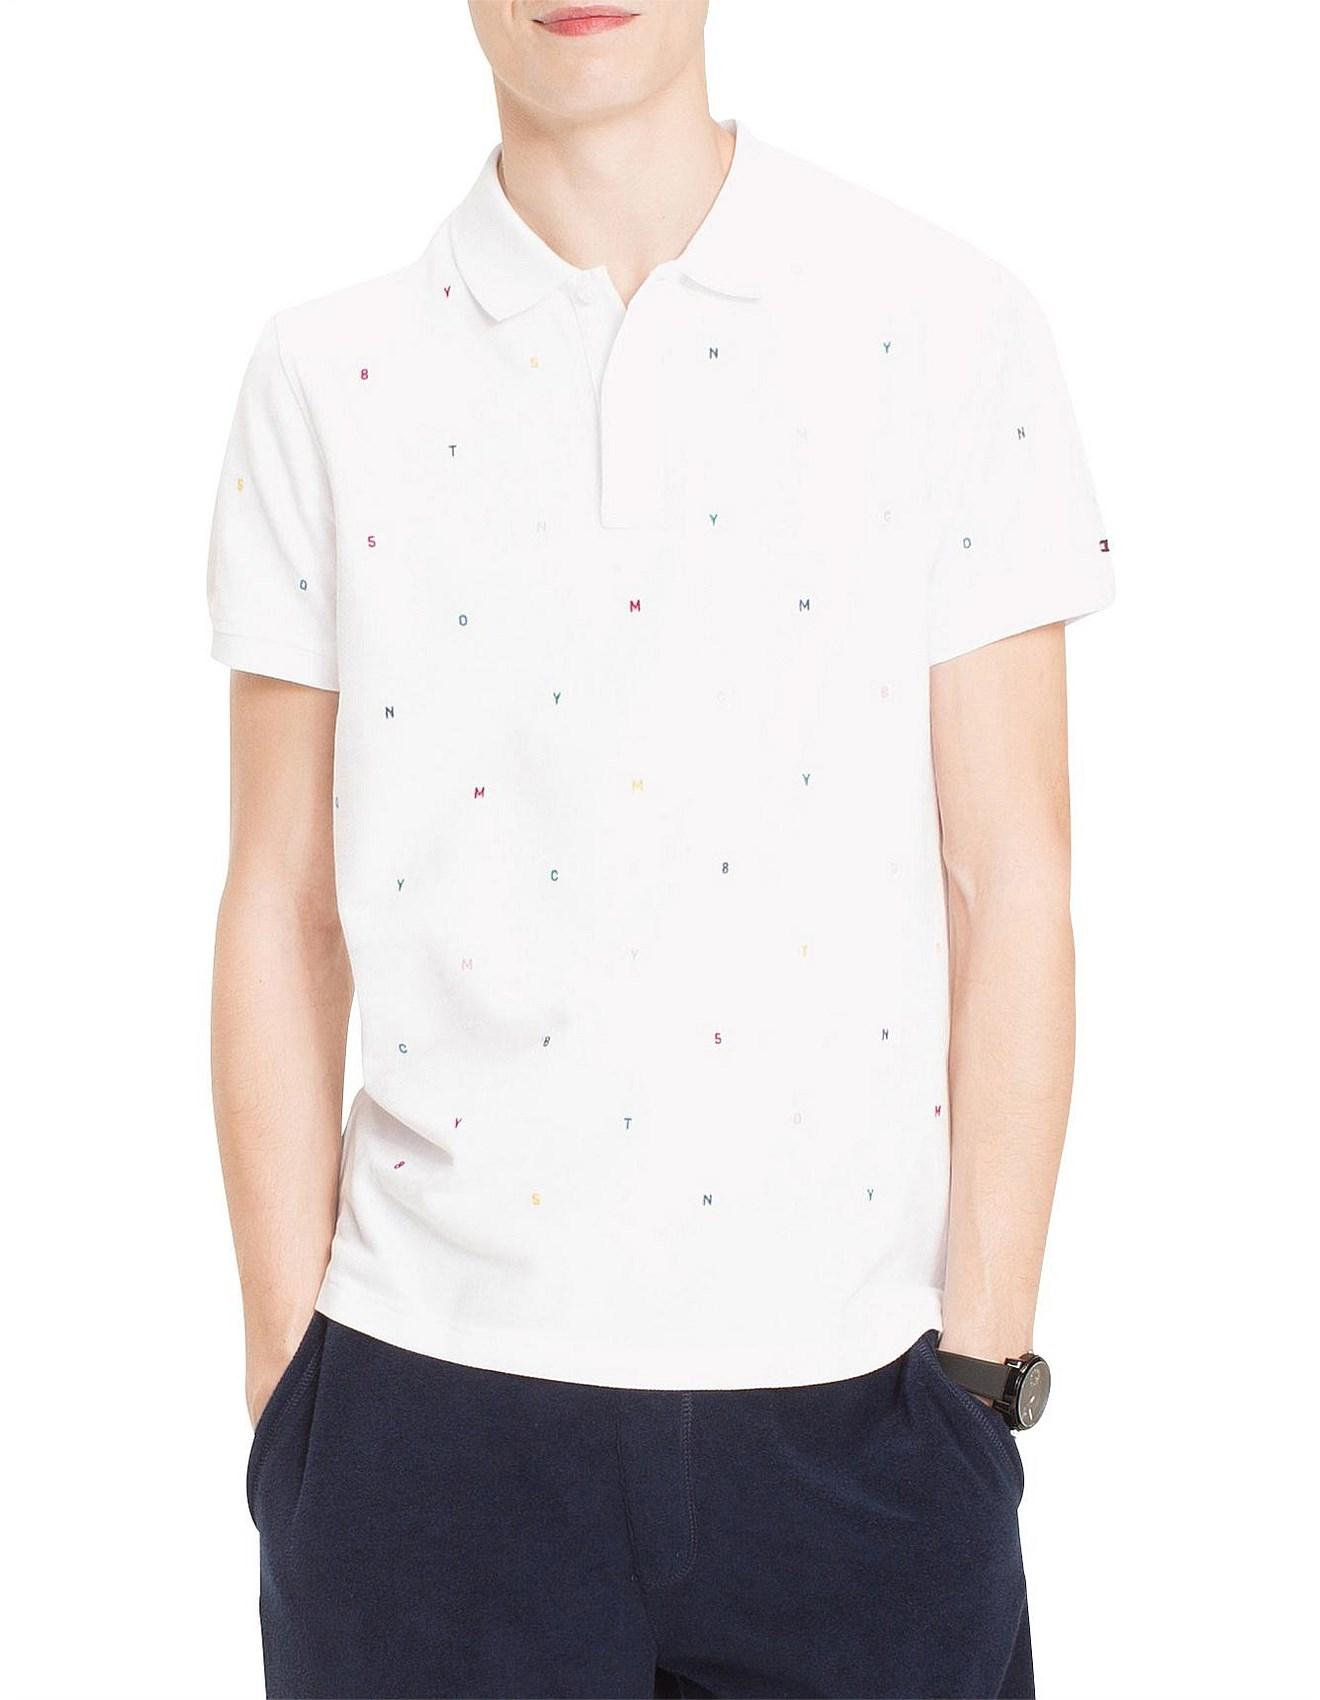 Men S Polo Shirts Sale Buy Polo Shirts Online David Jones